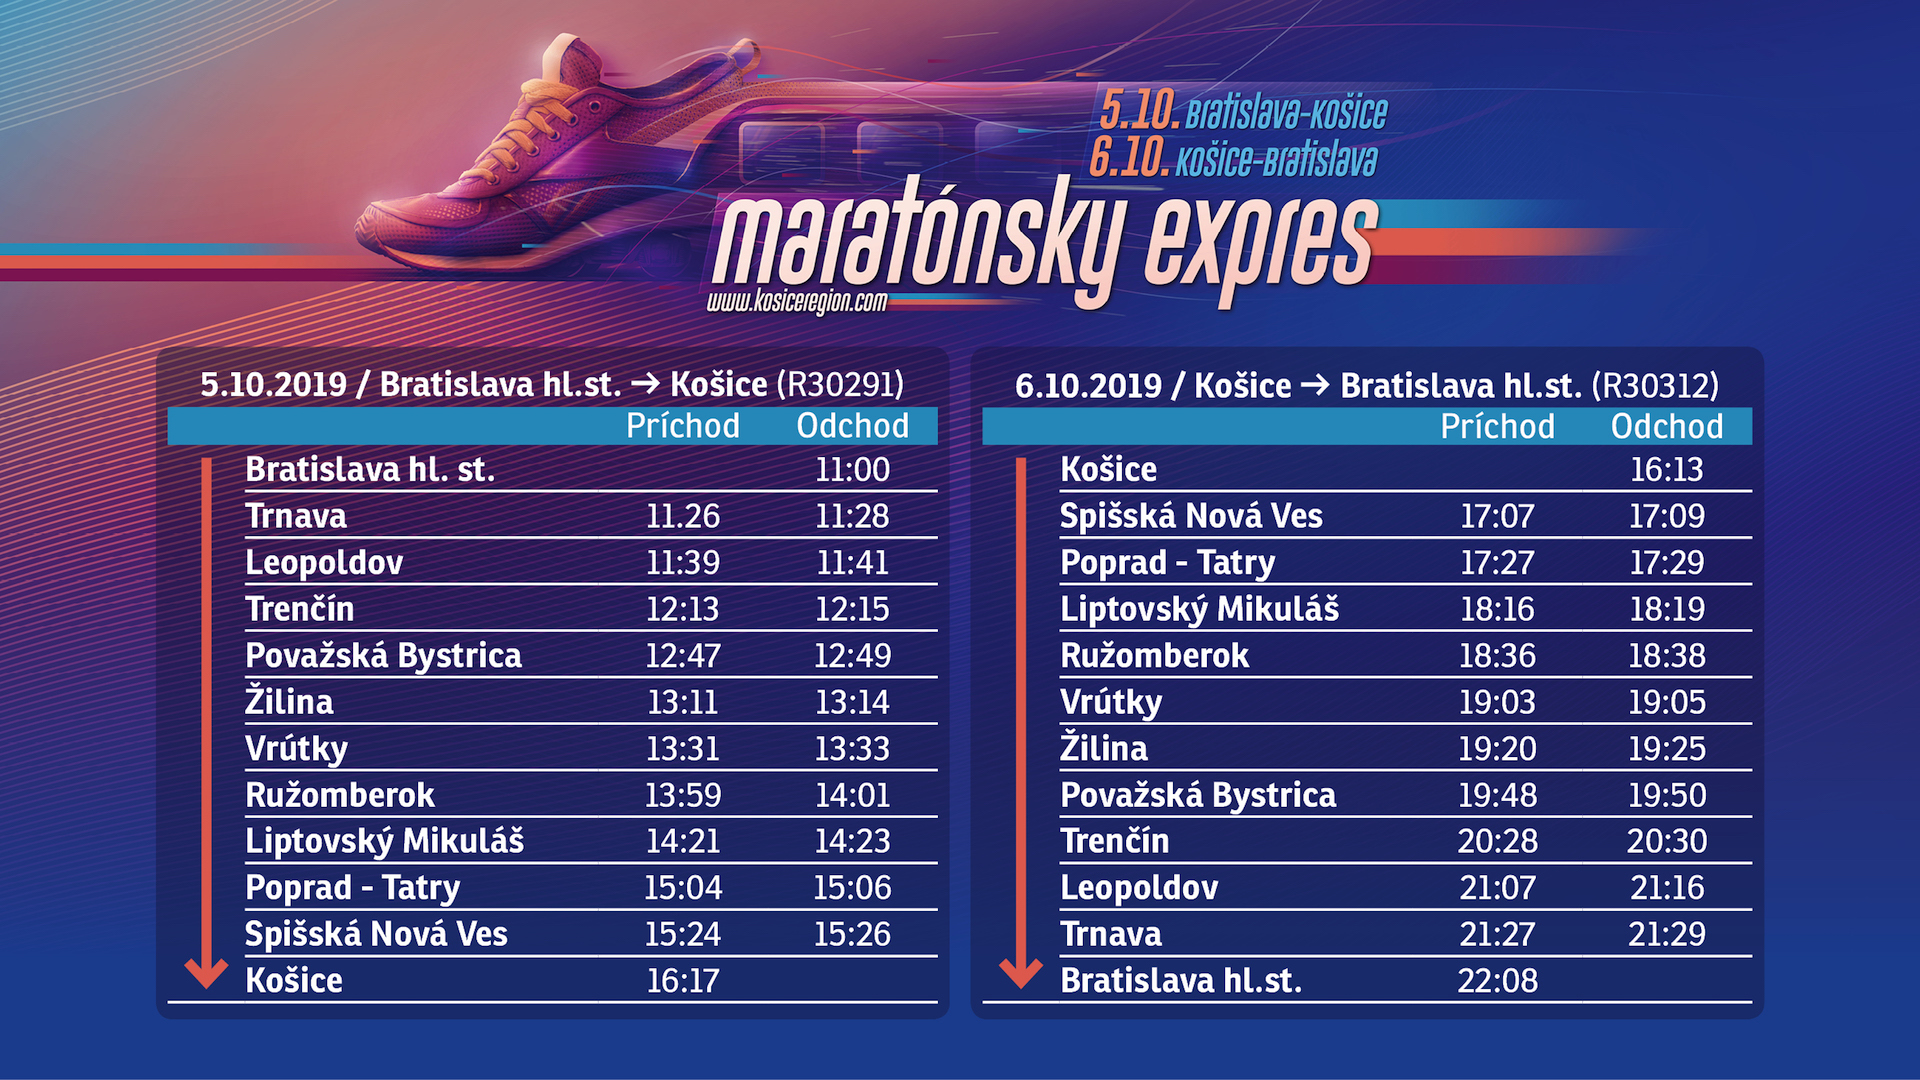 Cestovný poriadok Maratónsky expres